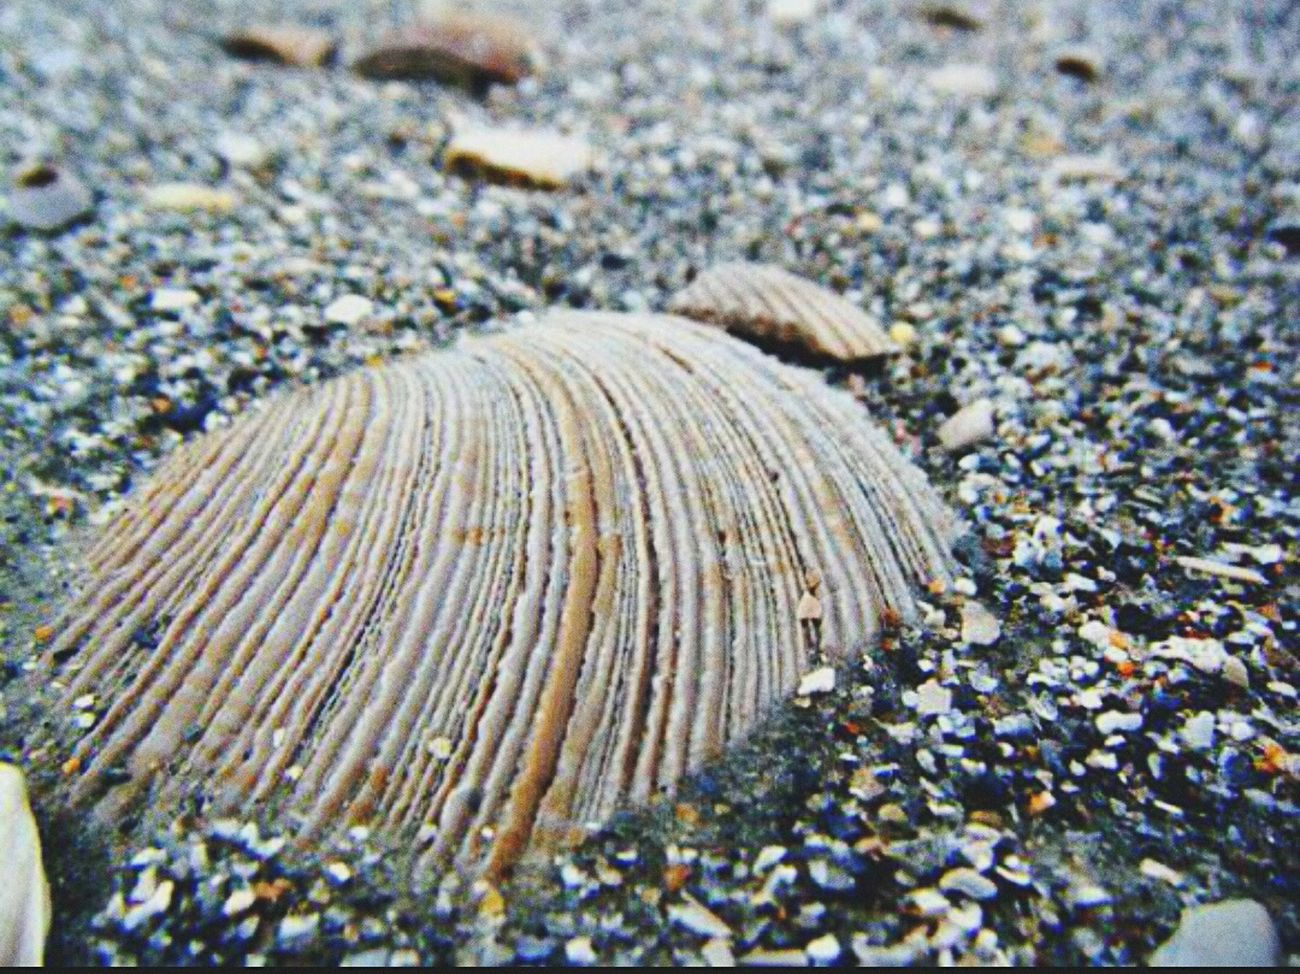 Morning stroll Beach Beach Photography Seashell Seashore Texture Upcloseandpersonal